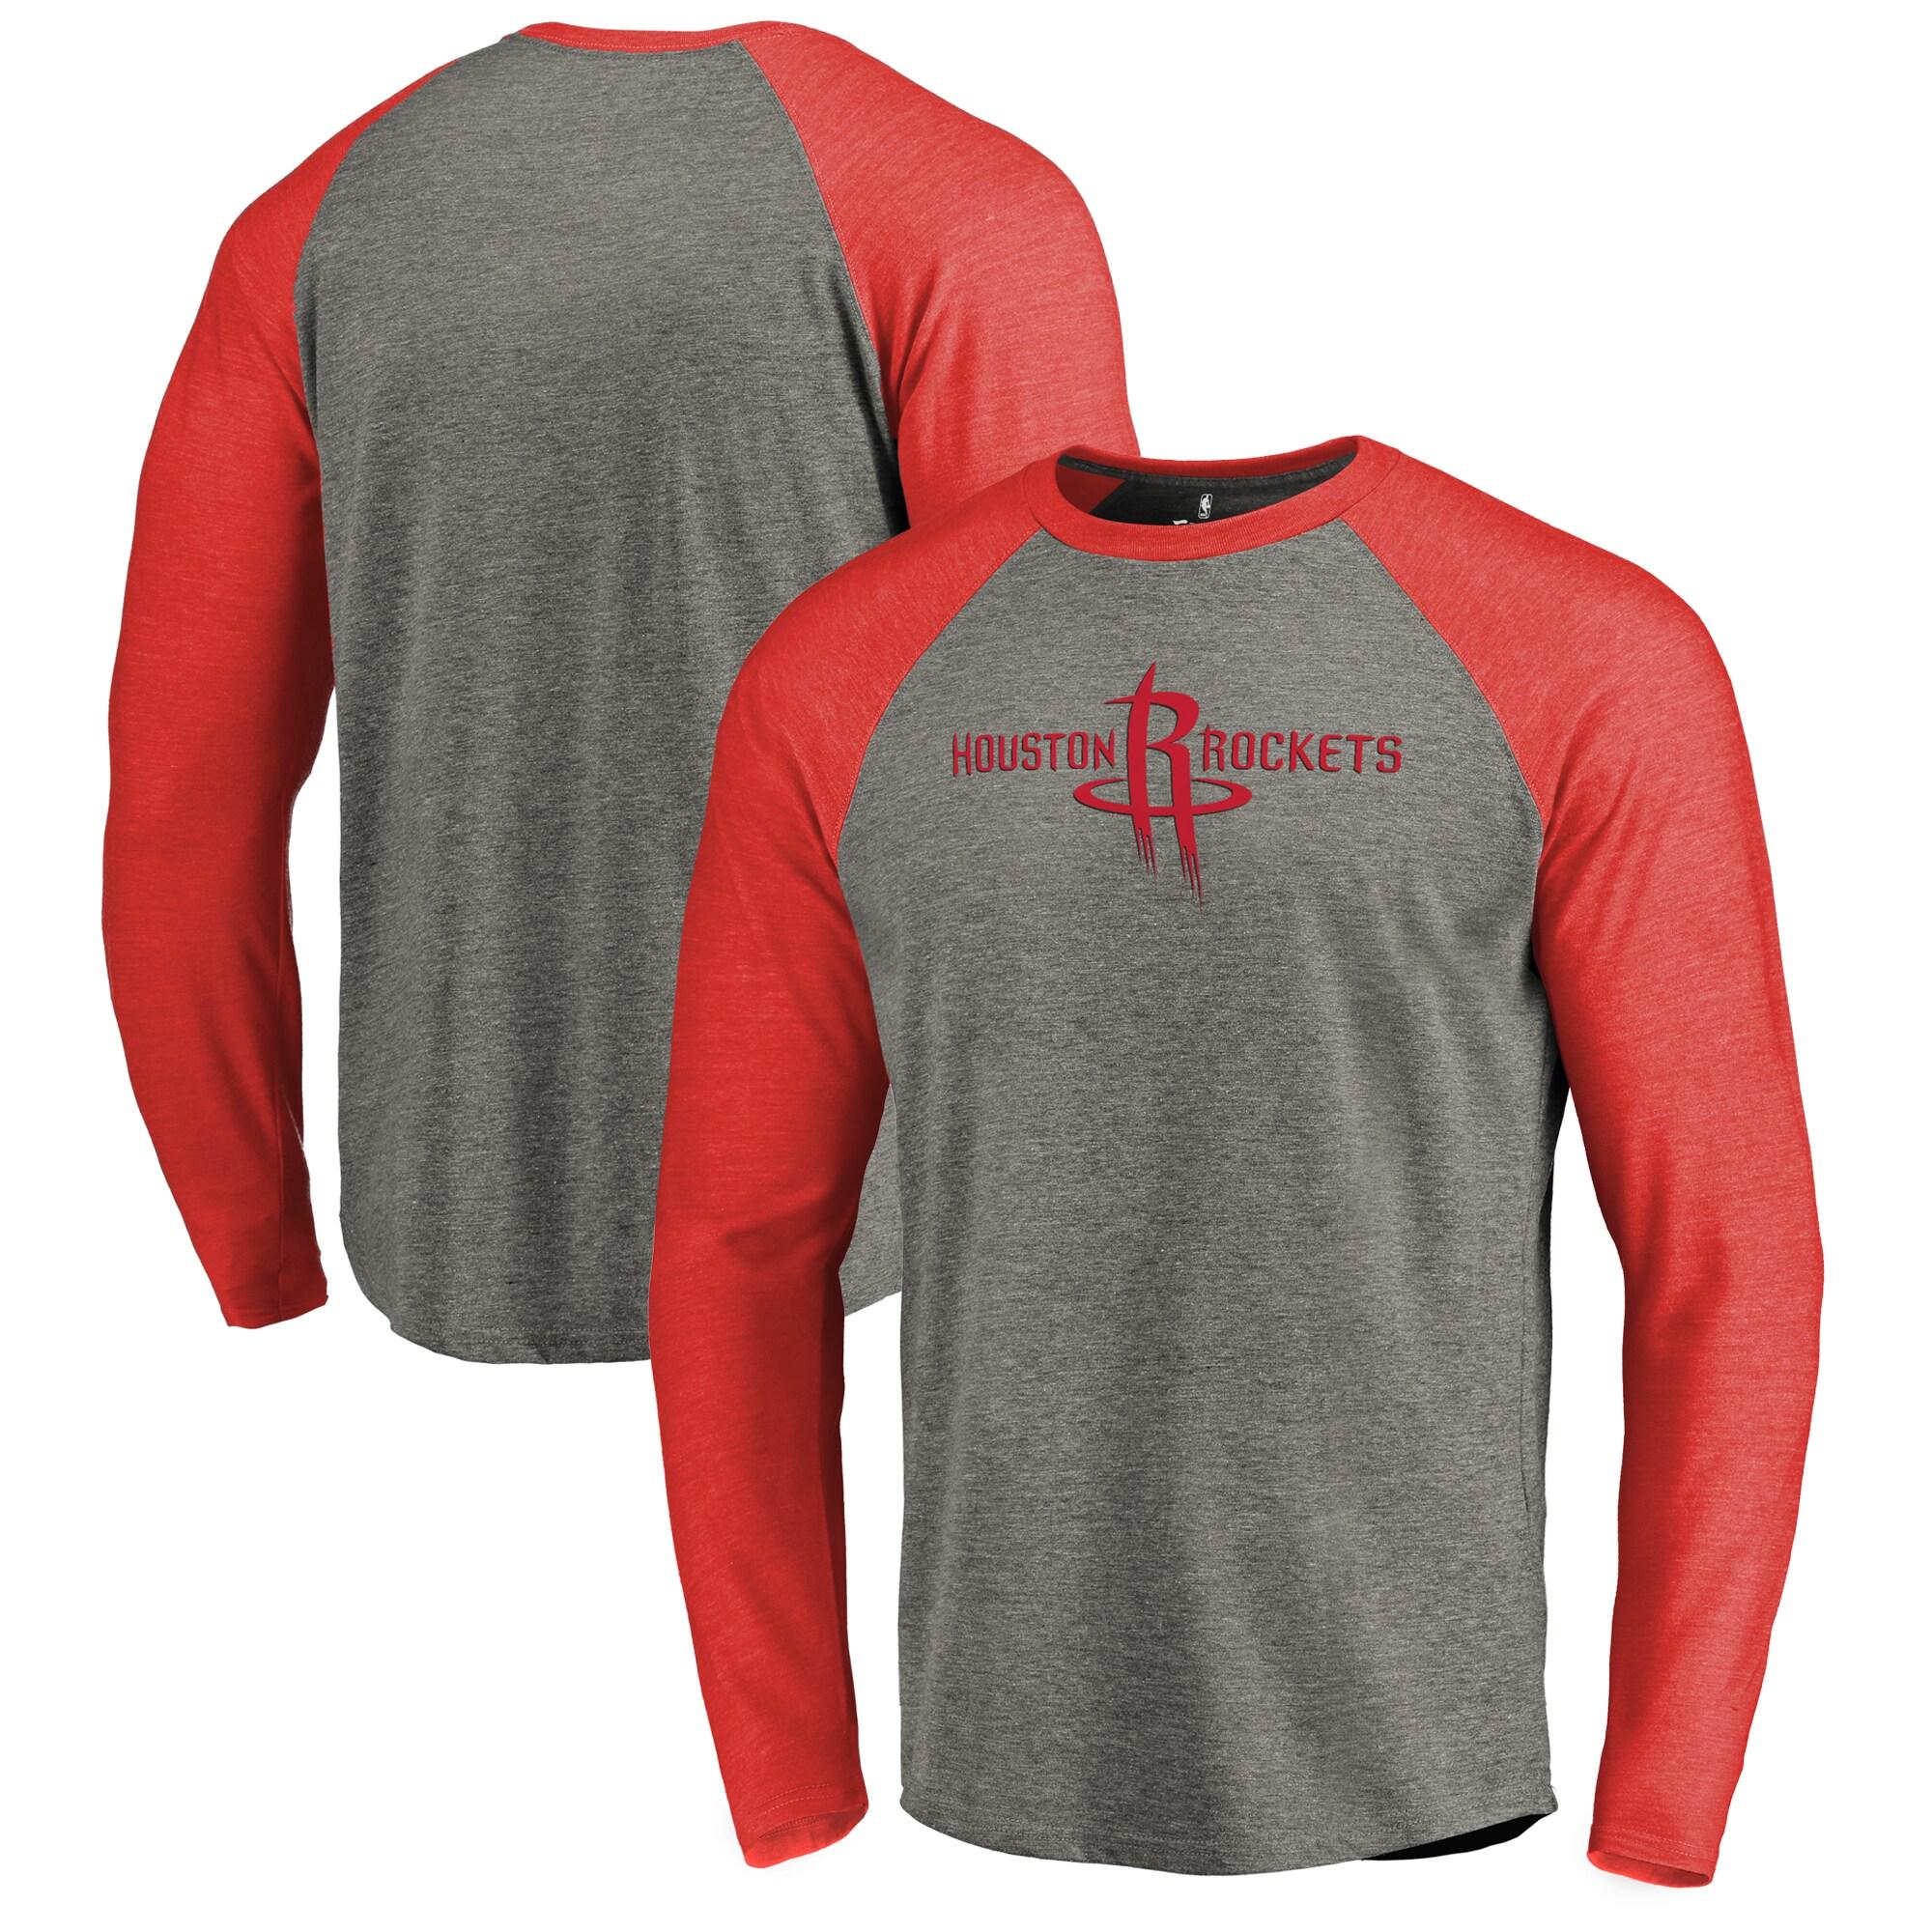 Houston Rockets Fanatics Branded Primary Logo Raglan Long Sleeve T-Shirt - Heathered Gray